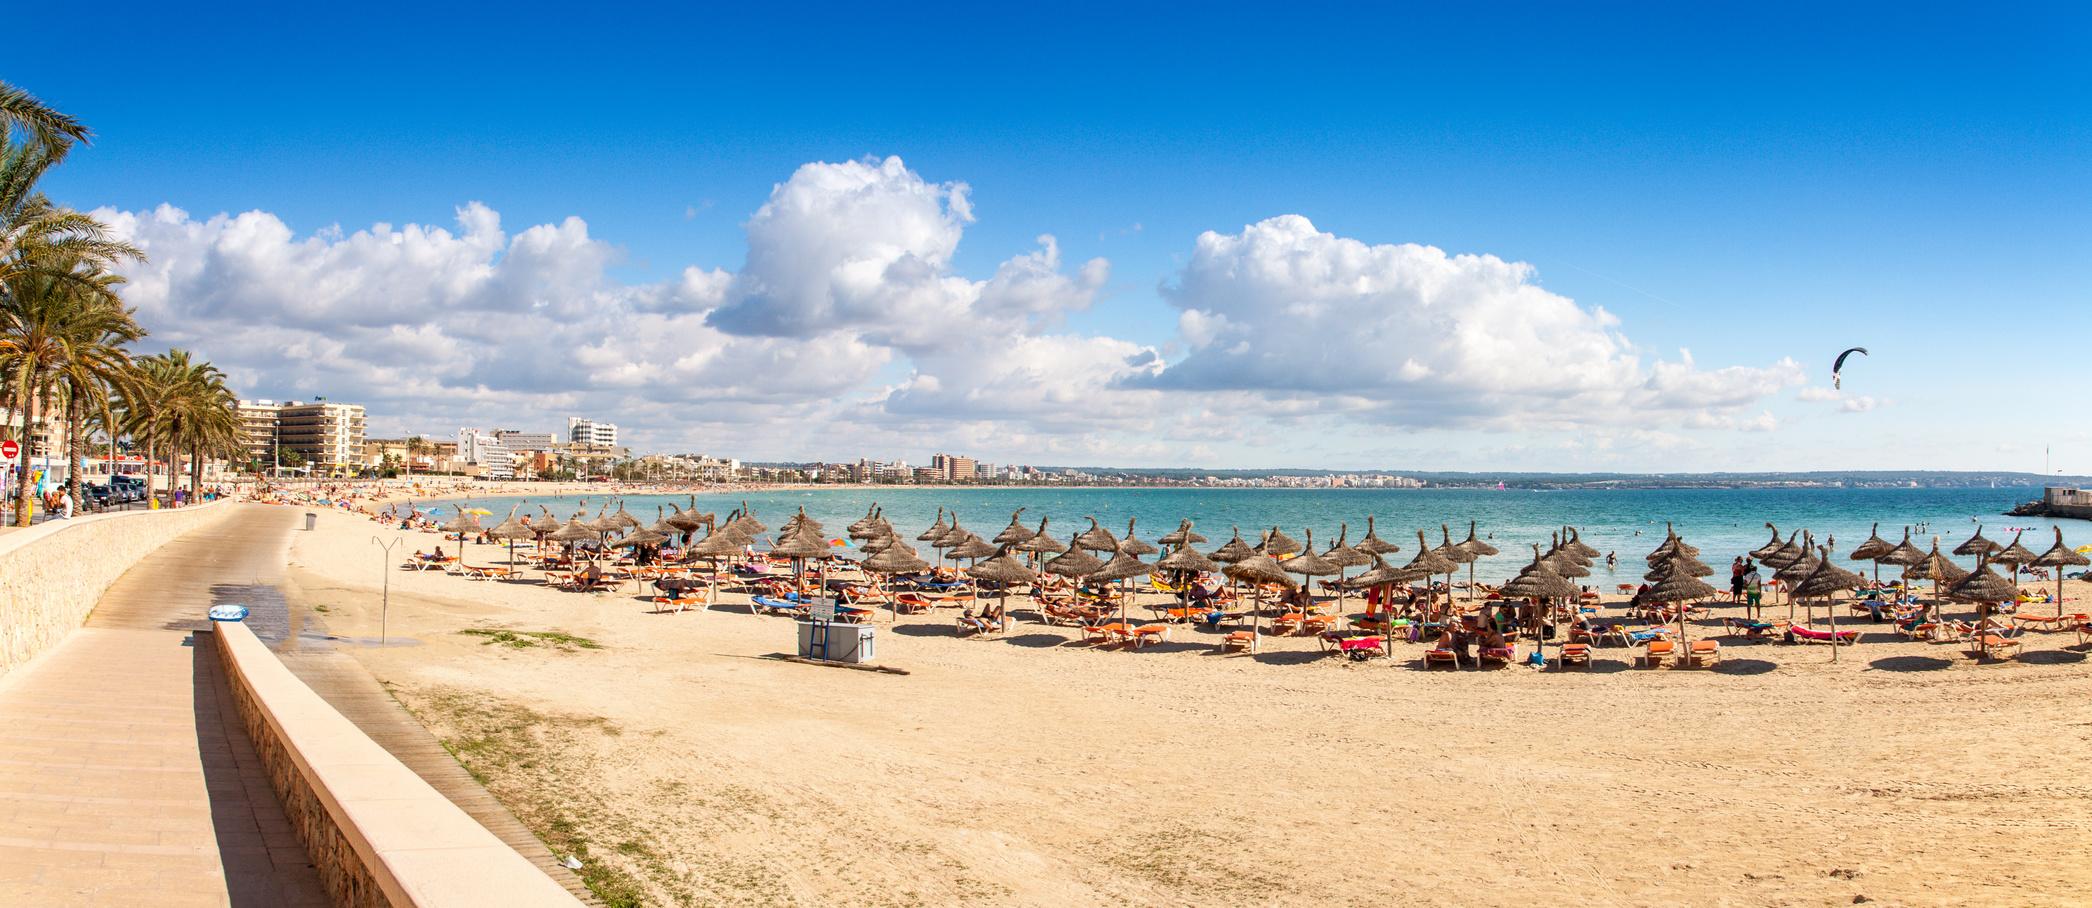 De mooiste eilanden van spanje for Design hotel mallorca strand